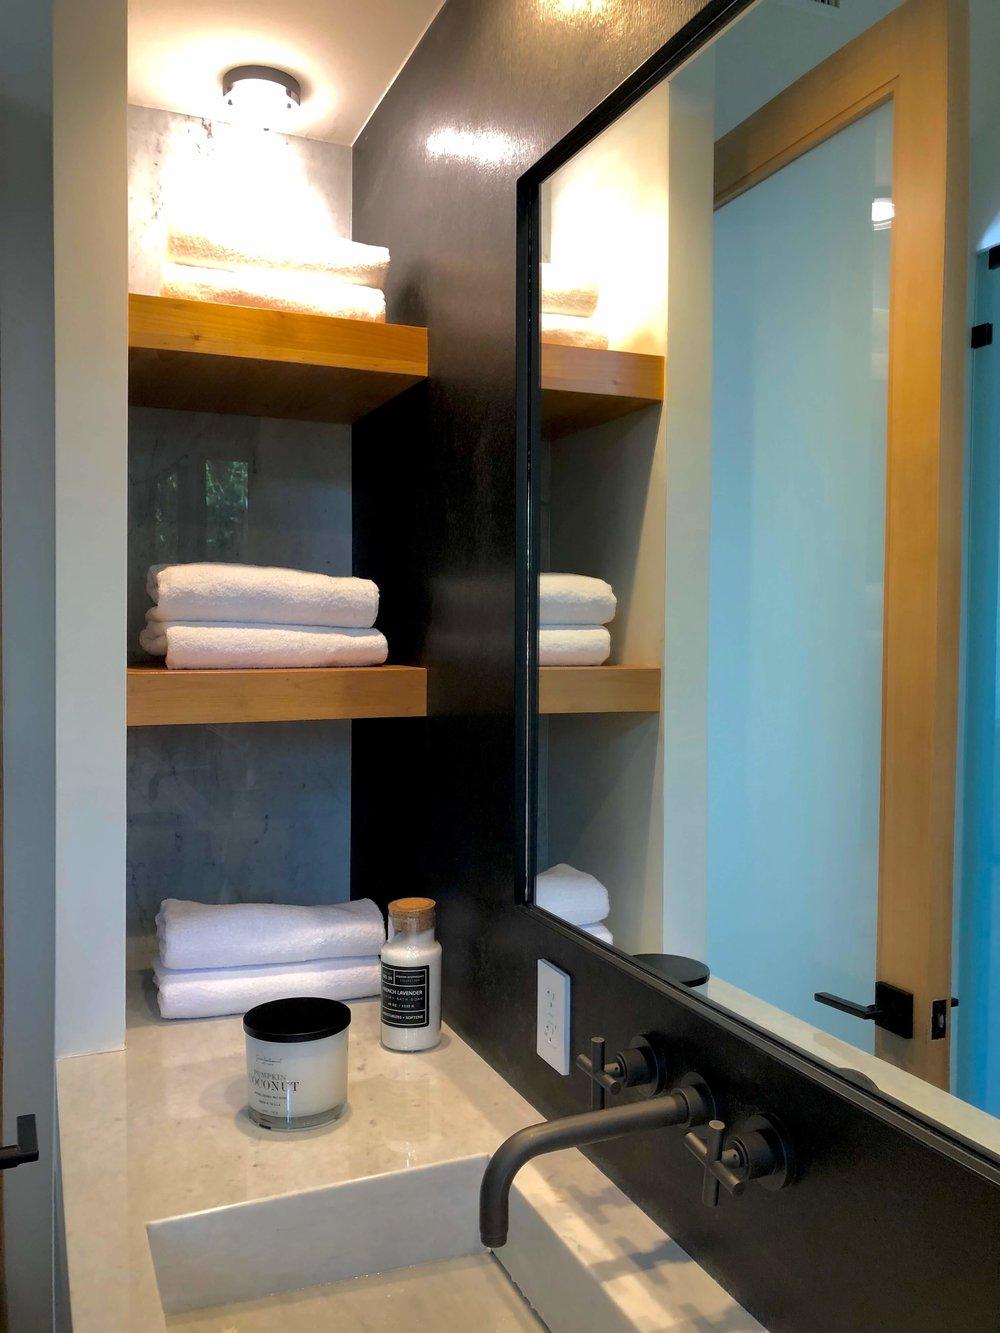 Master bathroom in California contemporary home, Dwell on Design's Fall Home Tour, Designer: Vitus Matare #bathroomideas #bathroomdesign